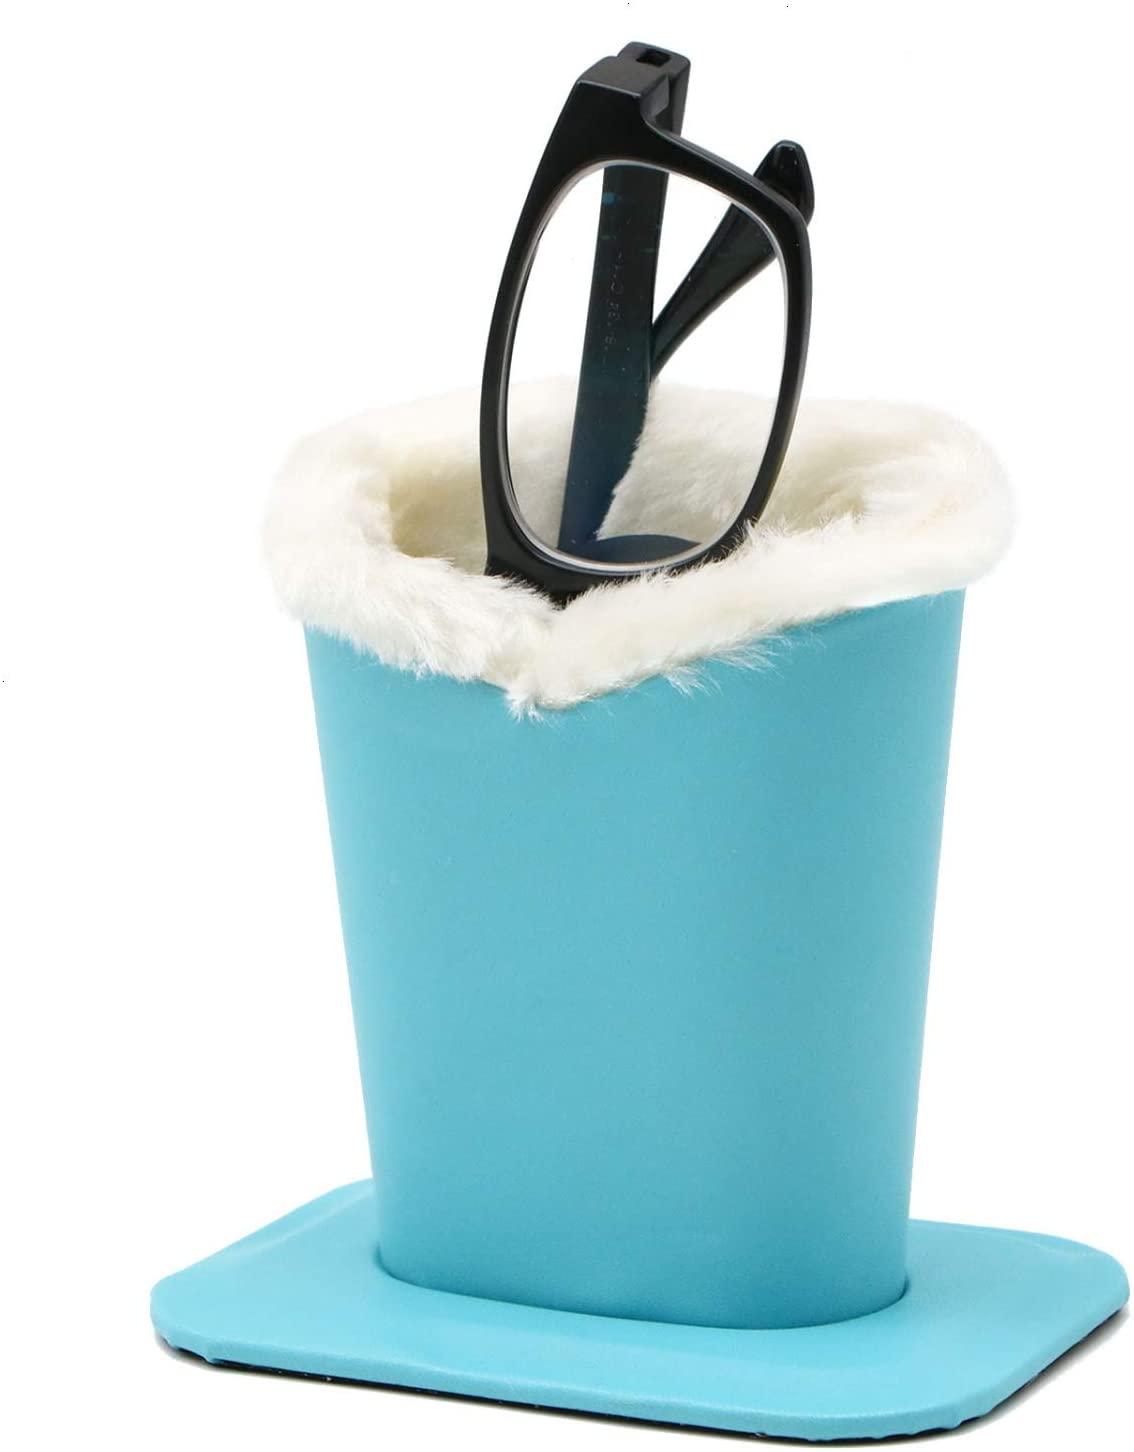 JETEHO Plush Lined Eyeglass Holder, Upright Eyeglass Holder & Stand - Eyeglasses Protective Case for Desk,Bedside Table and Nightstand (Blue)